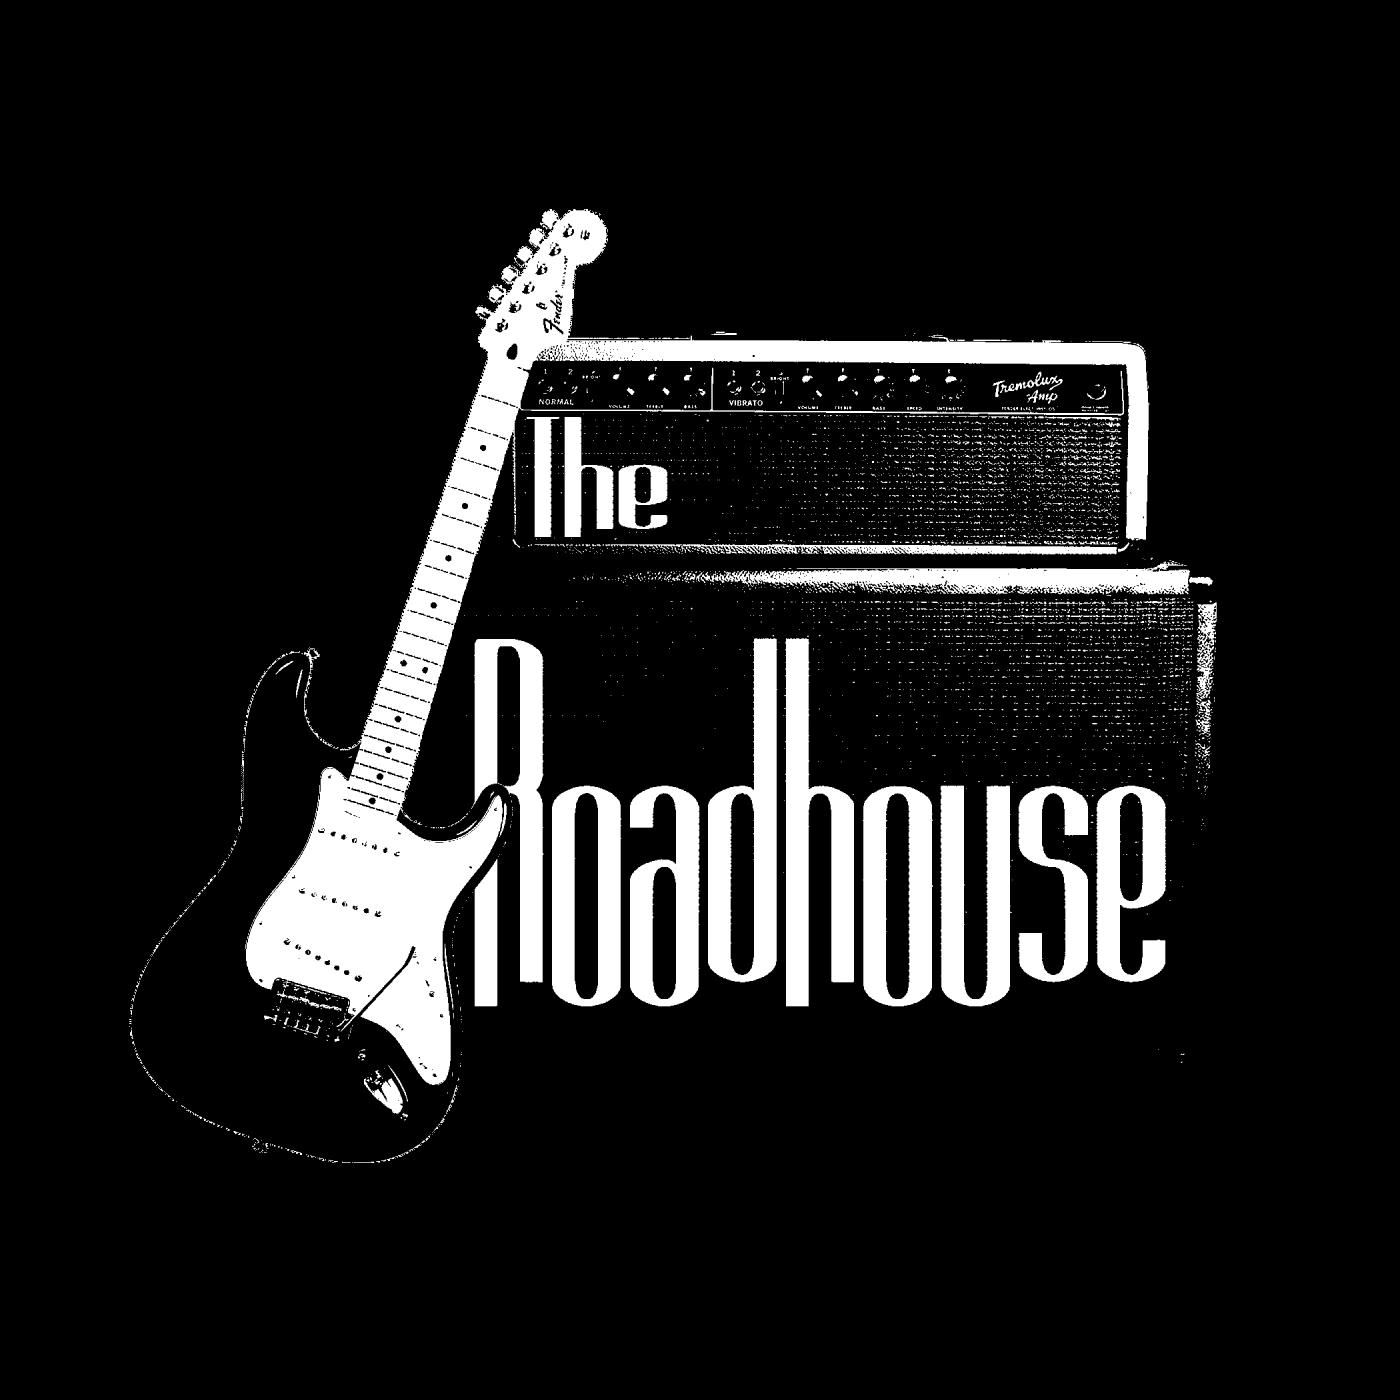 The Roadhouse show art